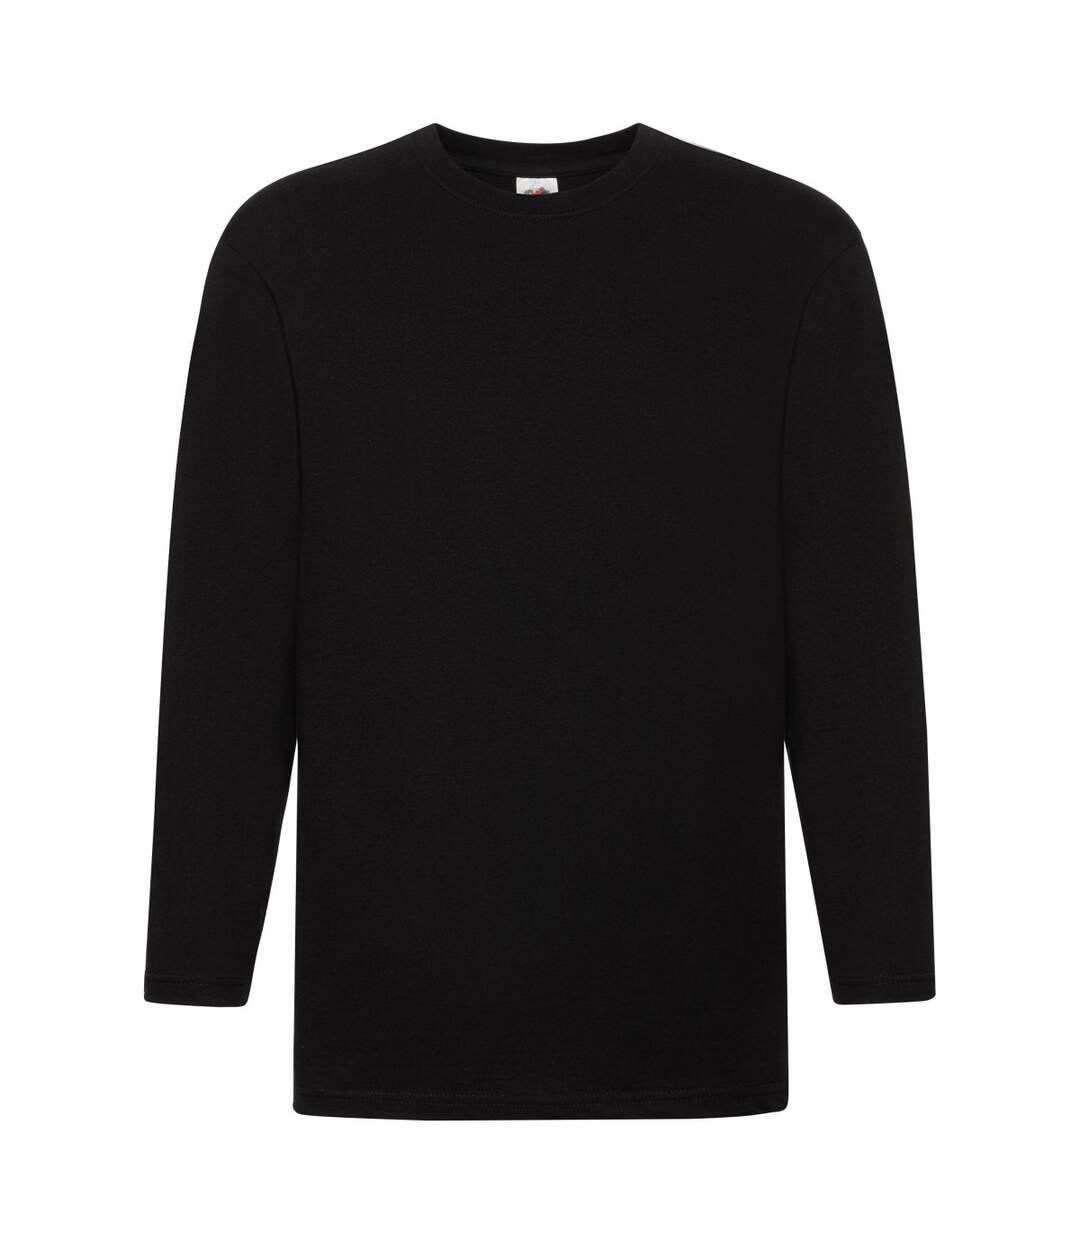 Fruit Of The Loom Mens Super Premium Long Sleeve Crew Neck T-Shirt (Black) - UTBC332